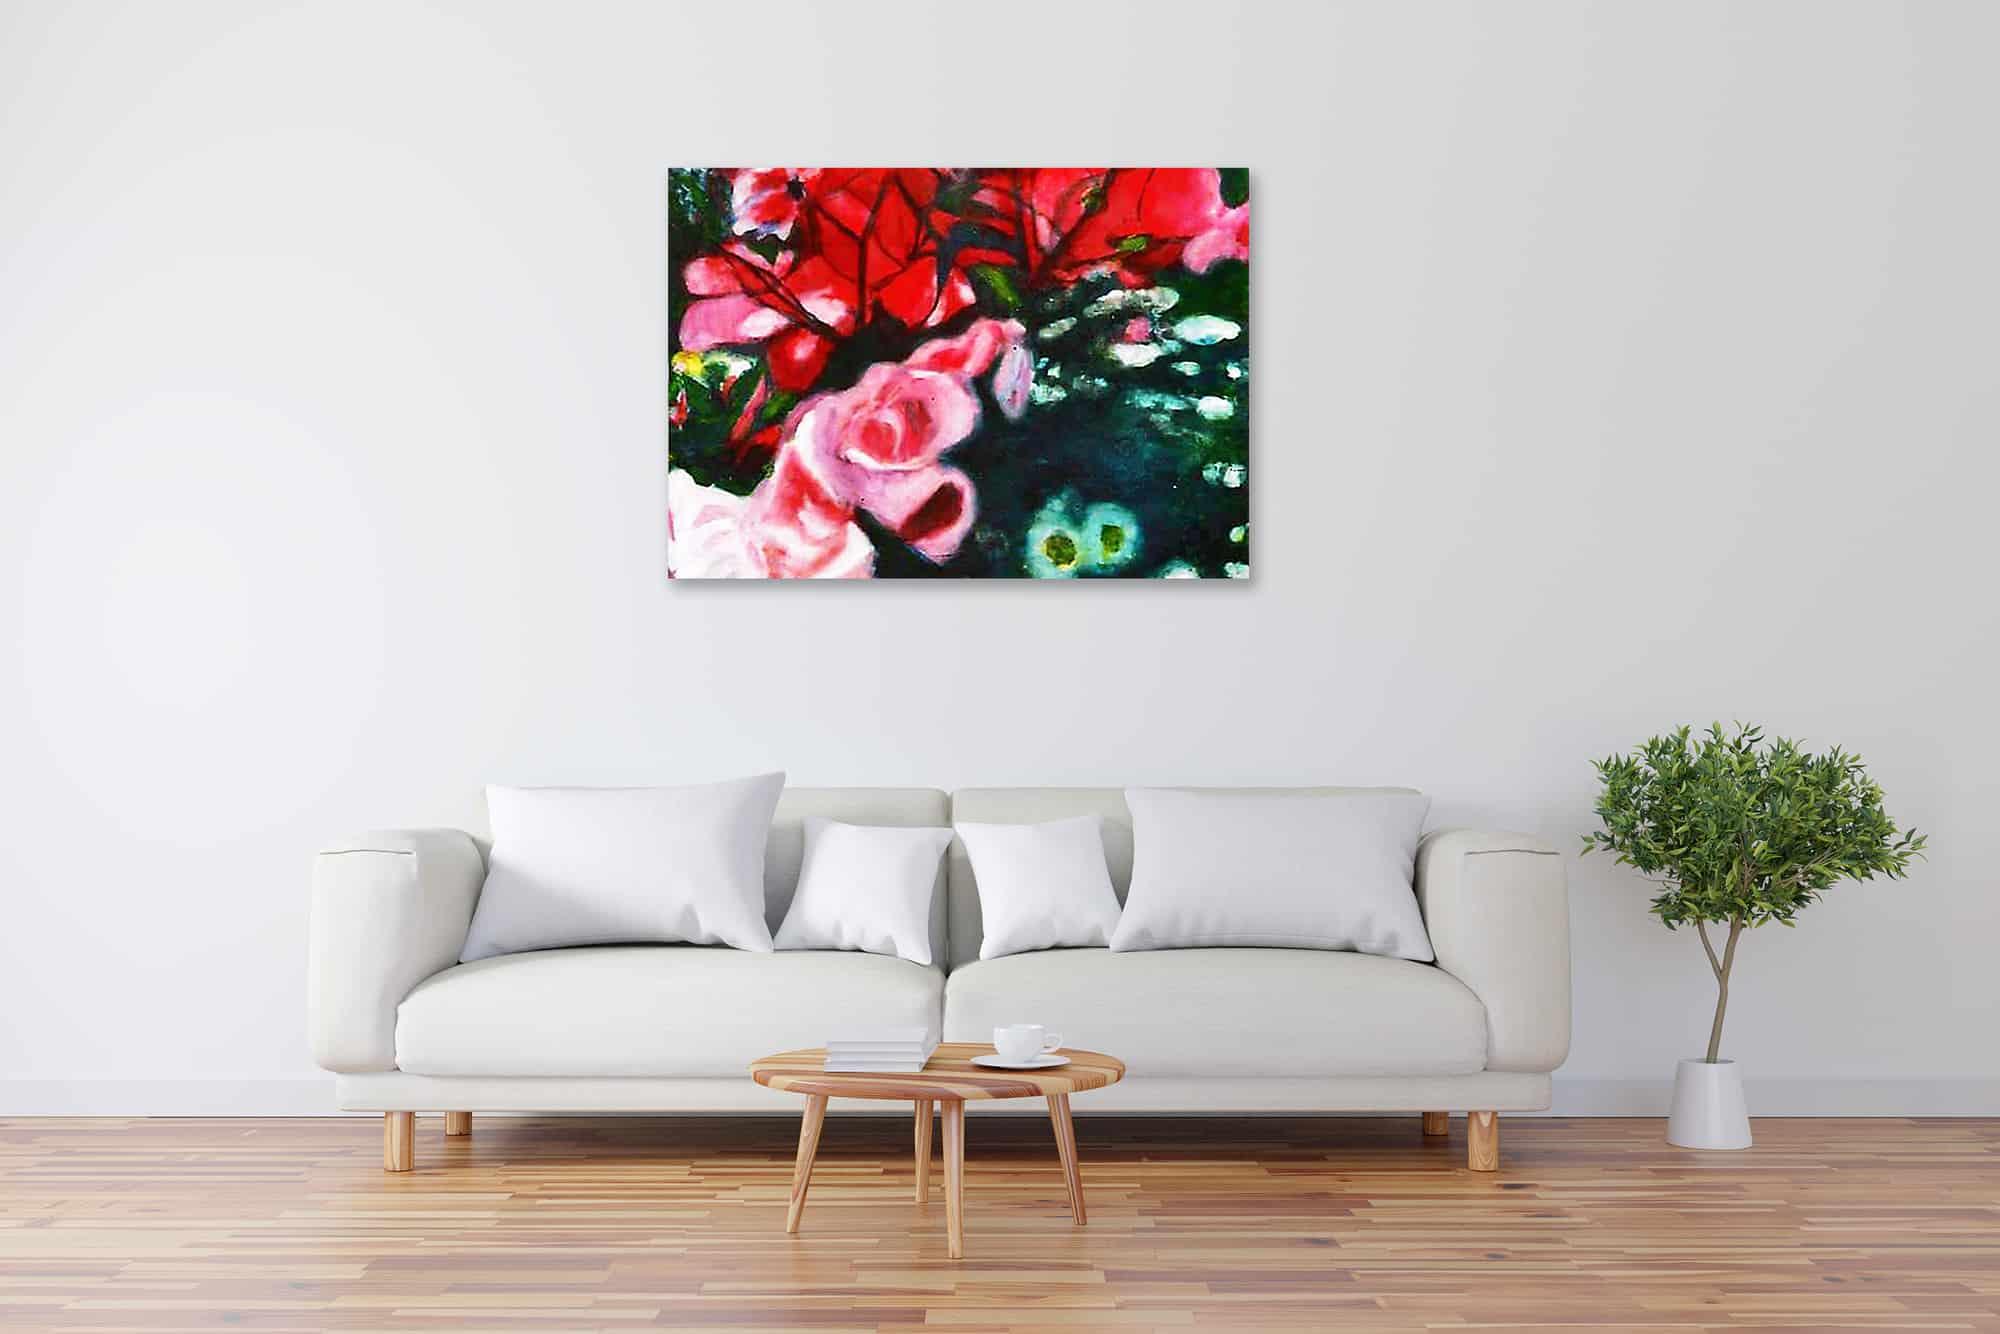 Acryl Gemälde Rosen bild kaufen